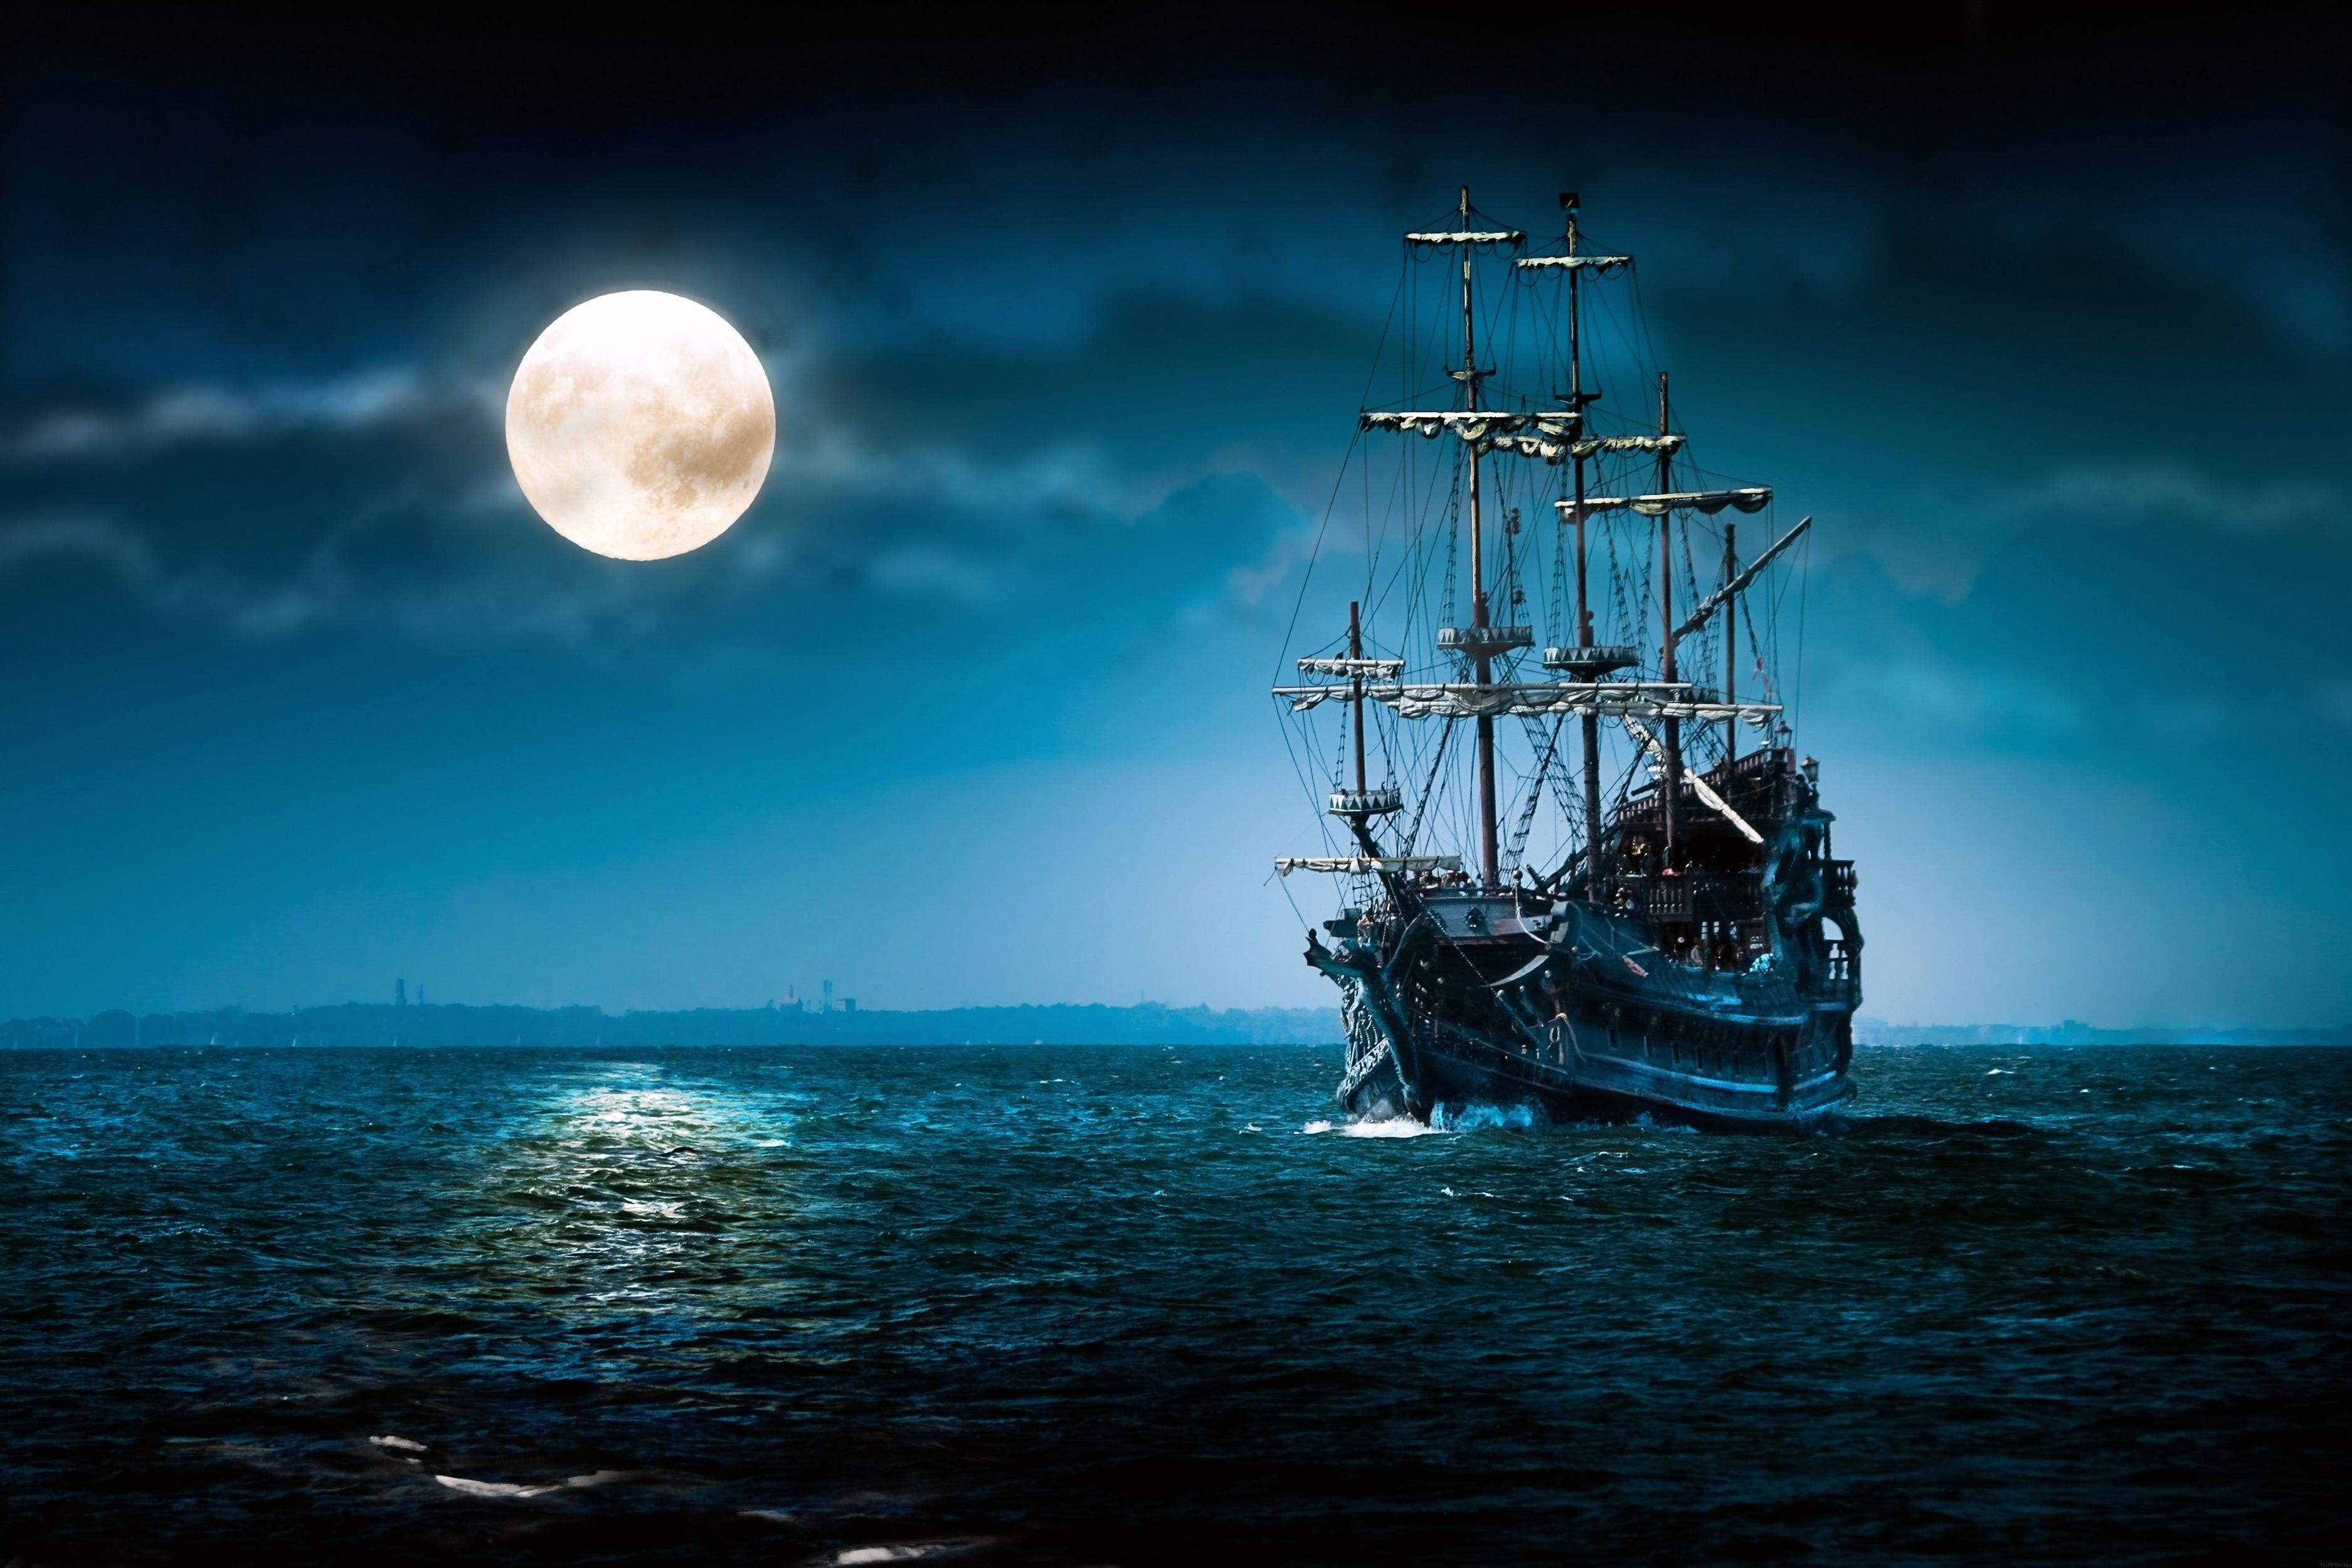 Wonderful Wallpaper Night Art - ship-3750x2500-sea-moon-night-4193  Collection.jpg